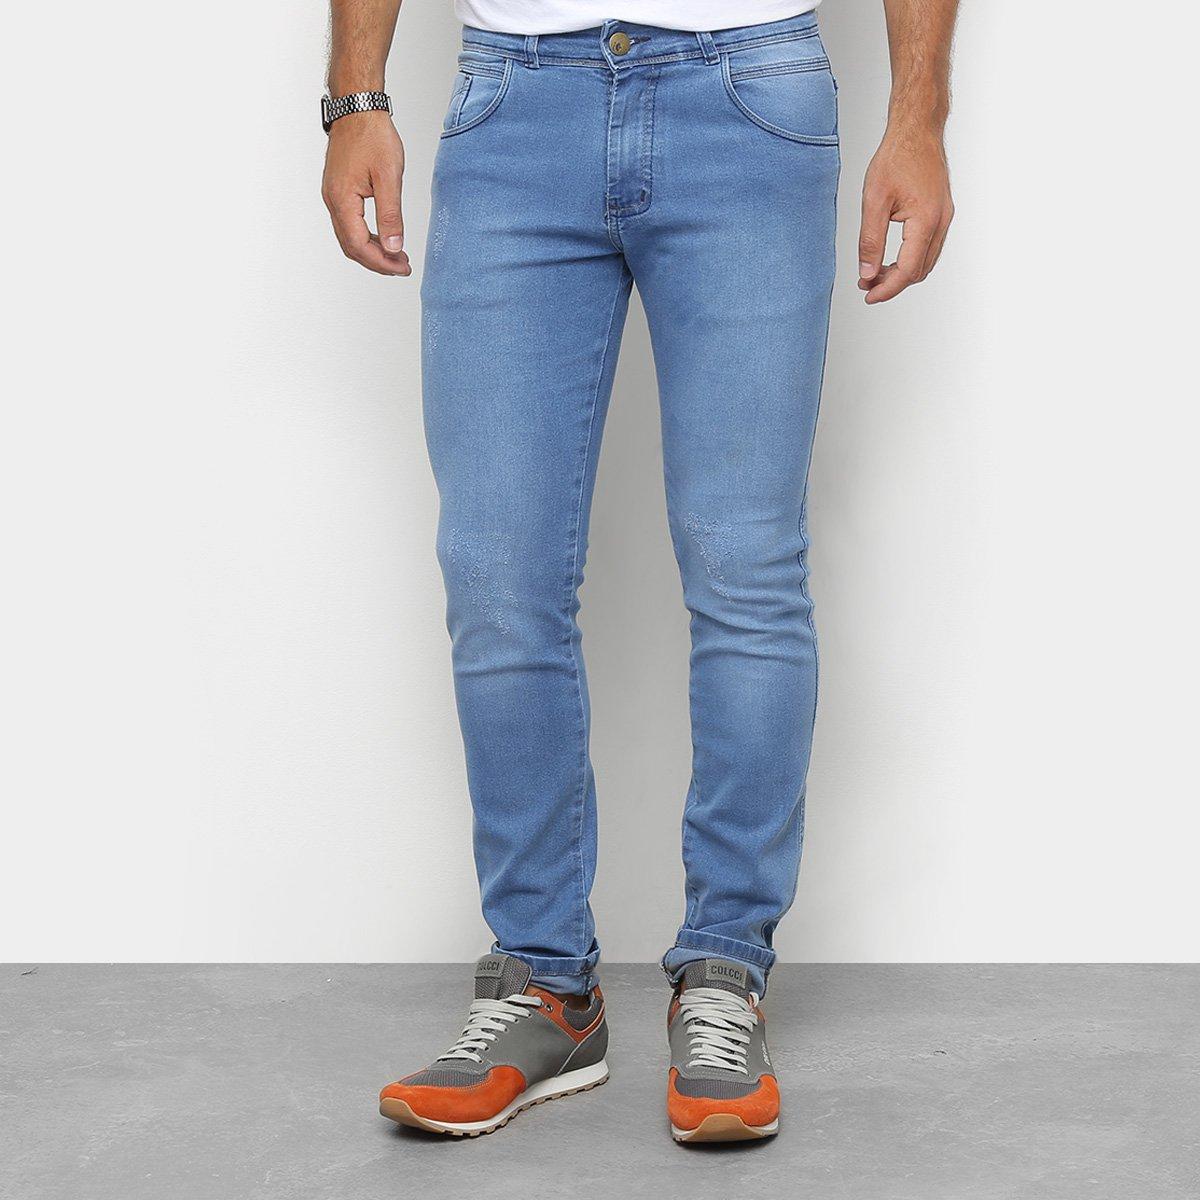 ace6cb492 Calça Jeans Skinny Coffee Rasgo Joelho Masculina